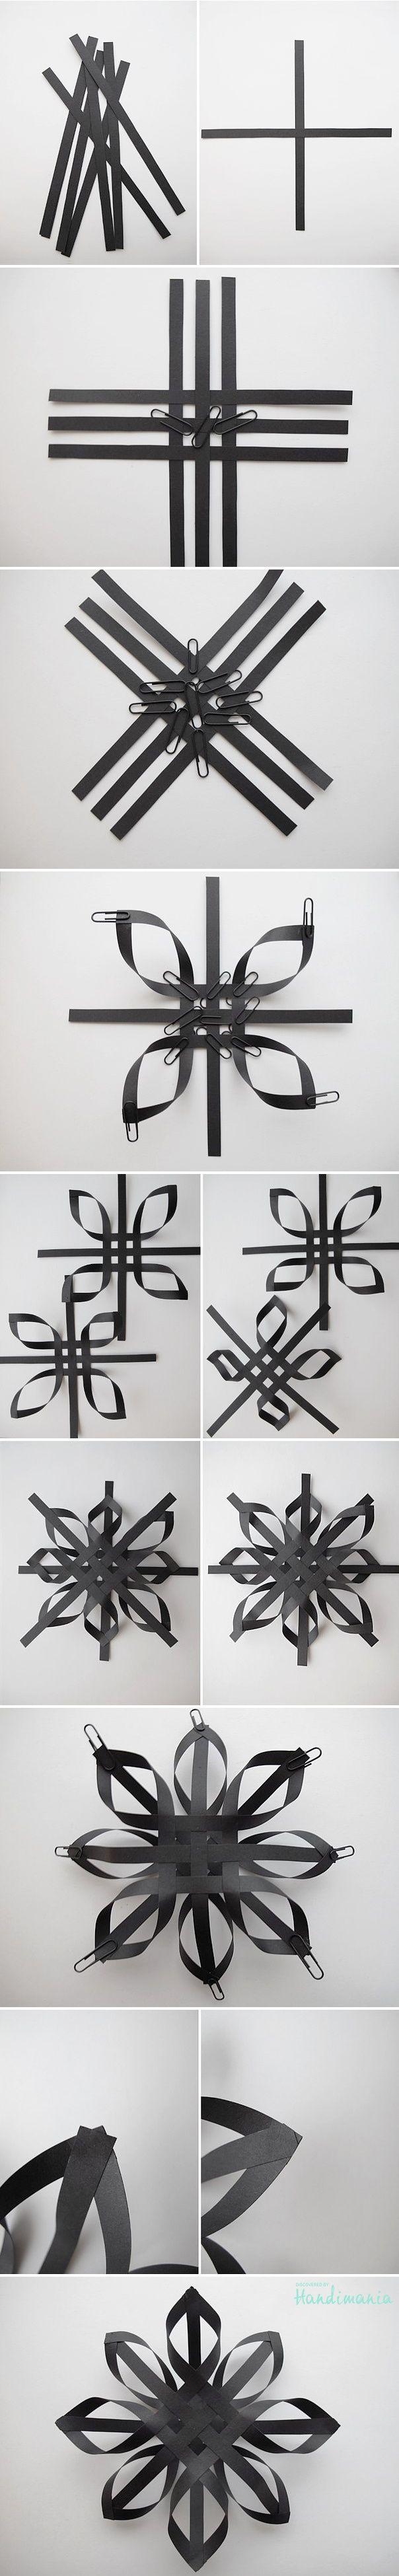 Black Paper Snowflake: